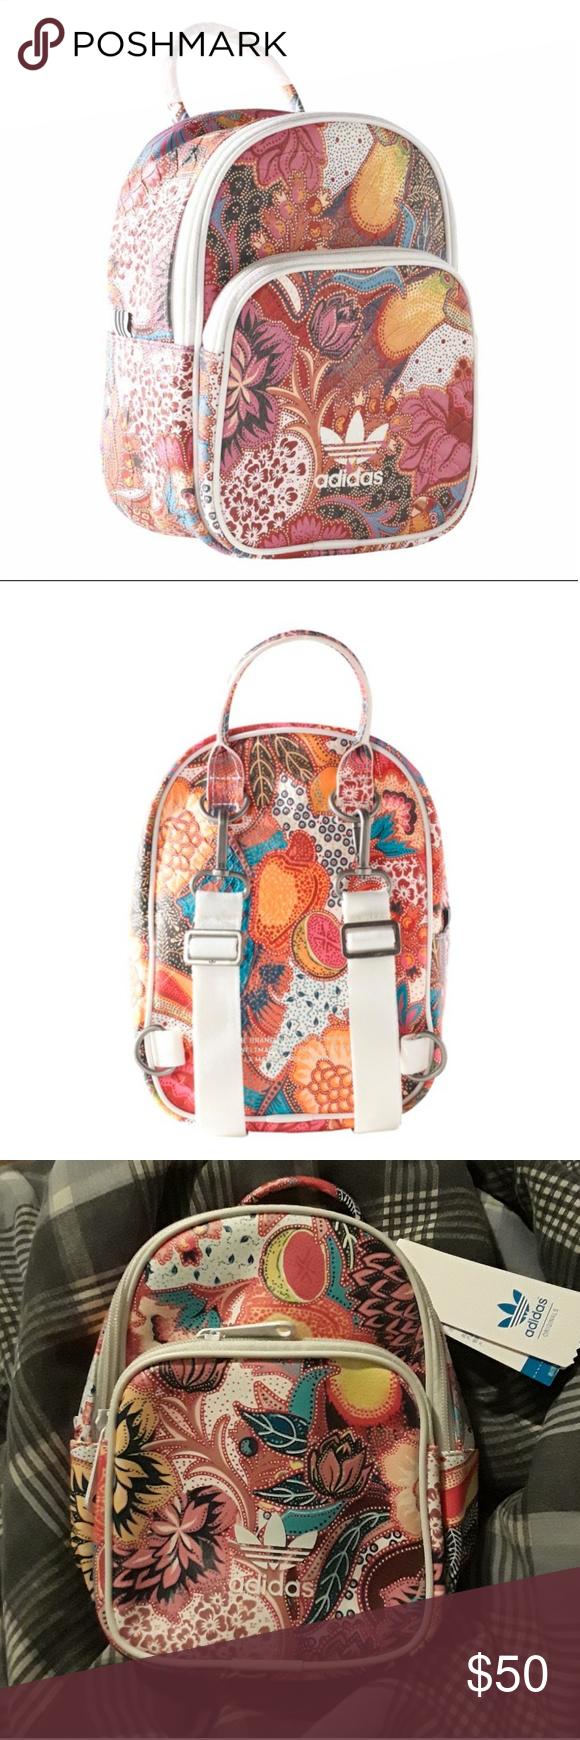 560e7996486 Adidas Fugiprabali Mini Backpack Brand New with Tags Adidas Originals  Fugiprabali Mini Backpack adidas Bags Backpacks